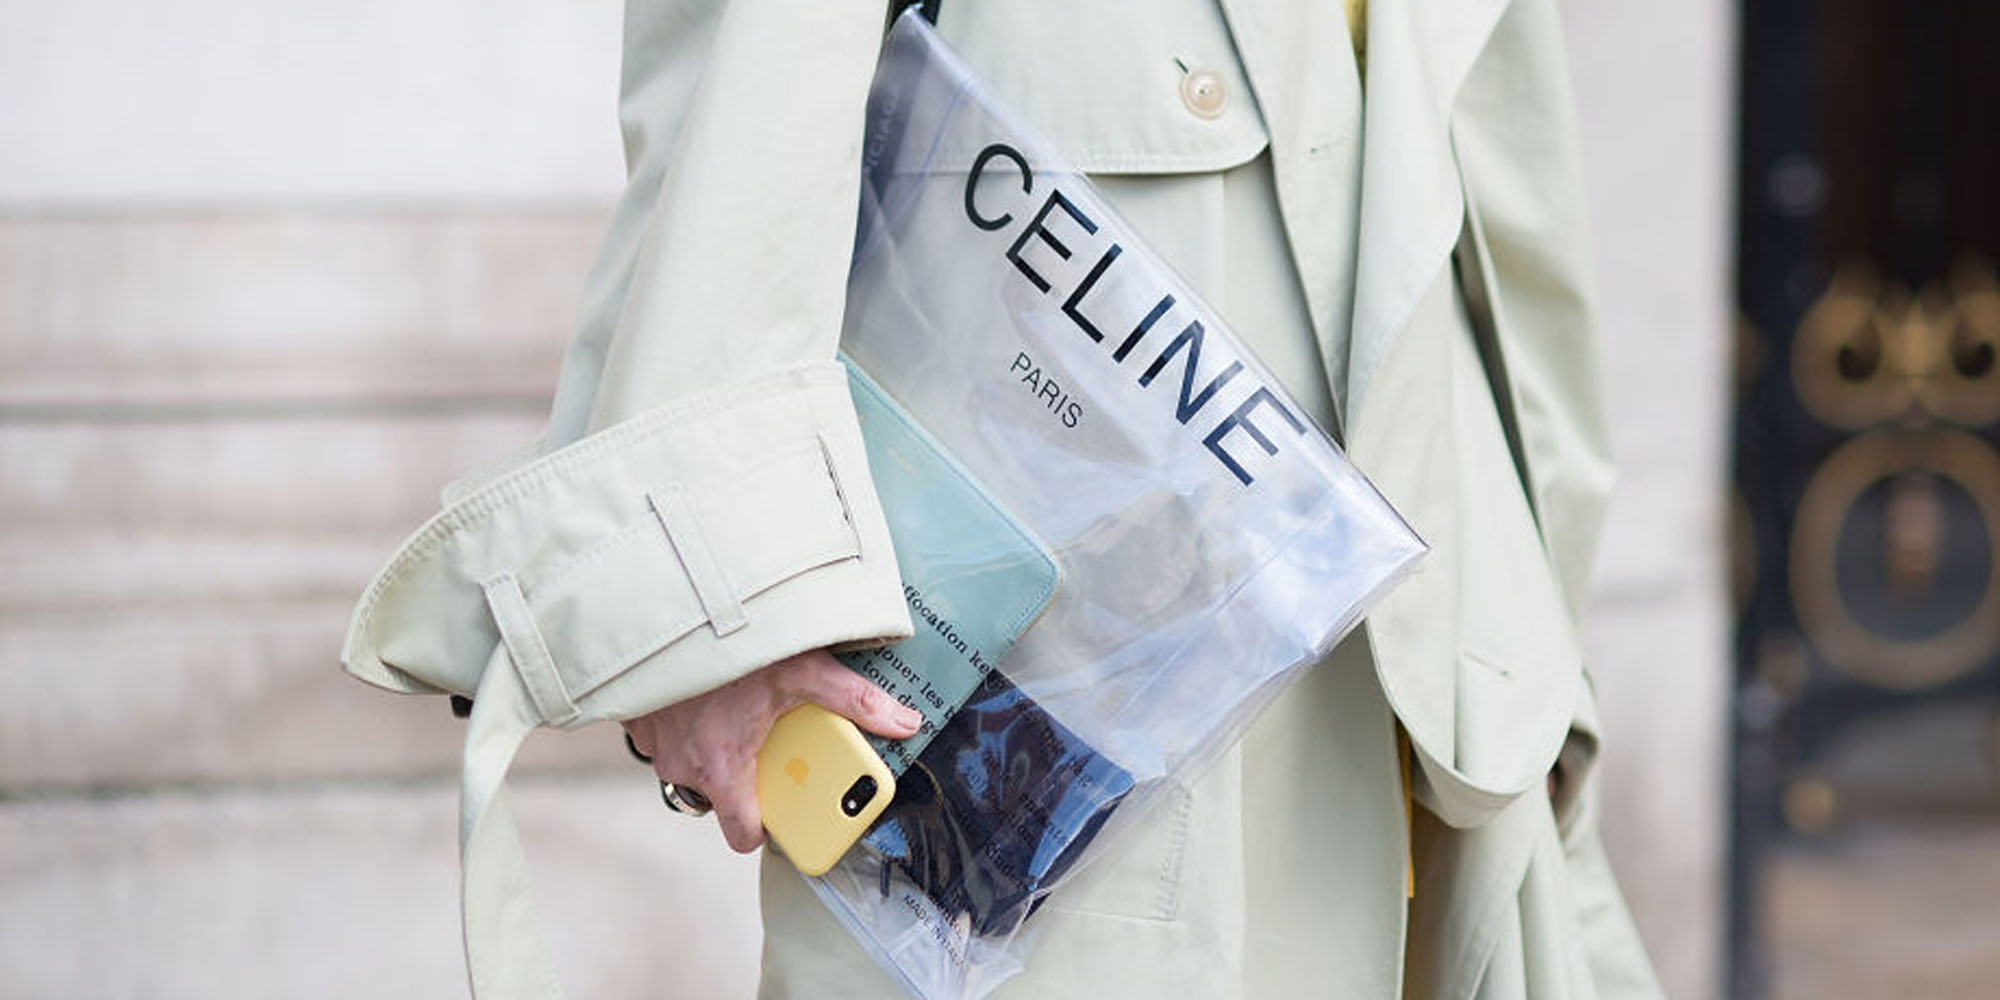 Céline, logo, celine, modermerk, modehuis